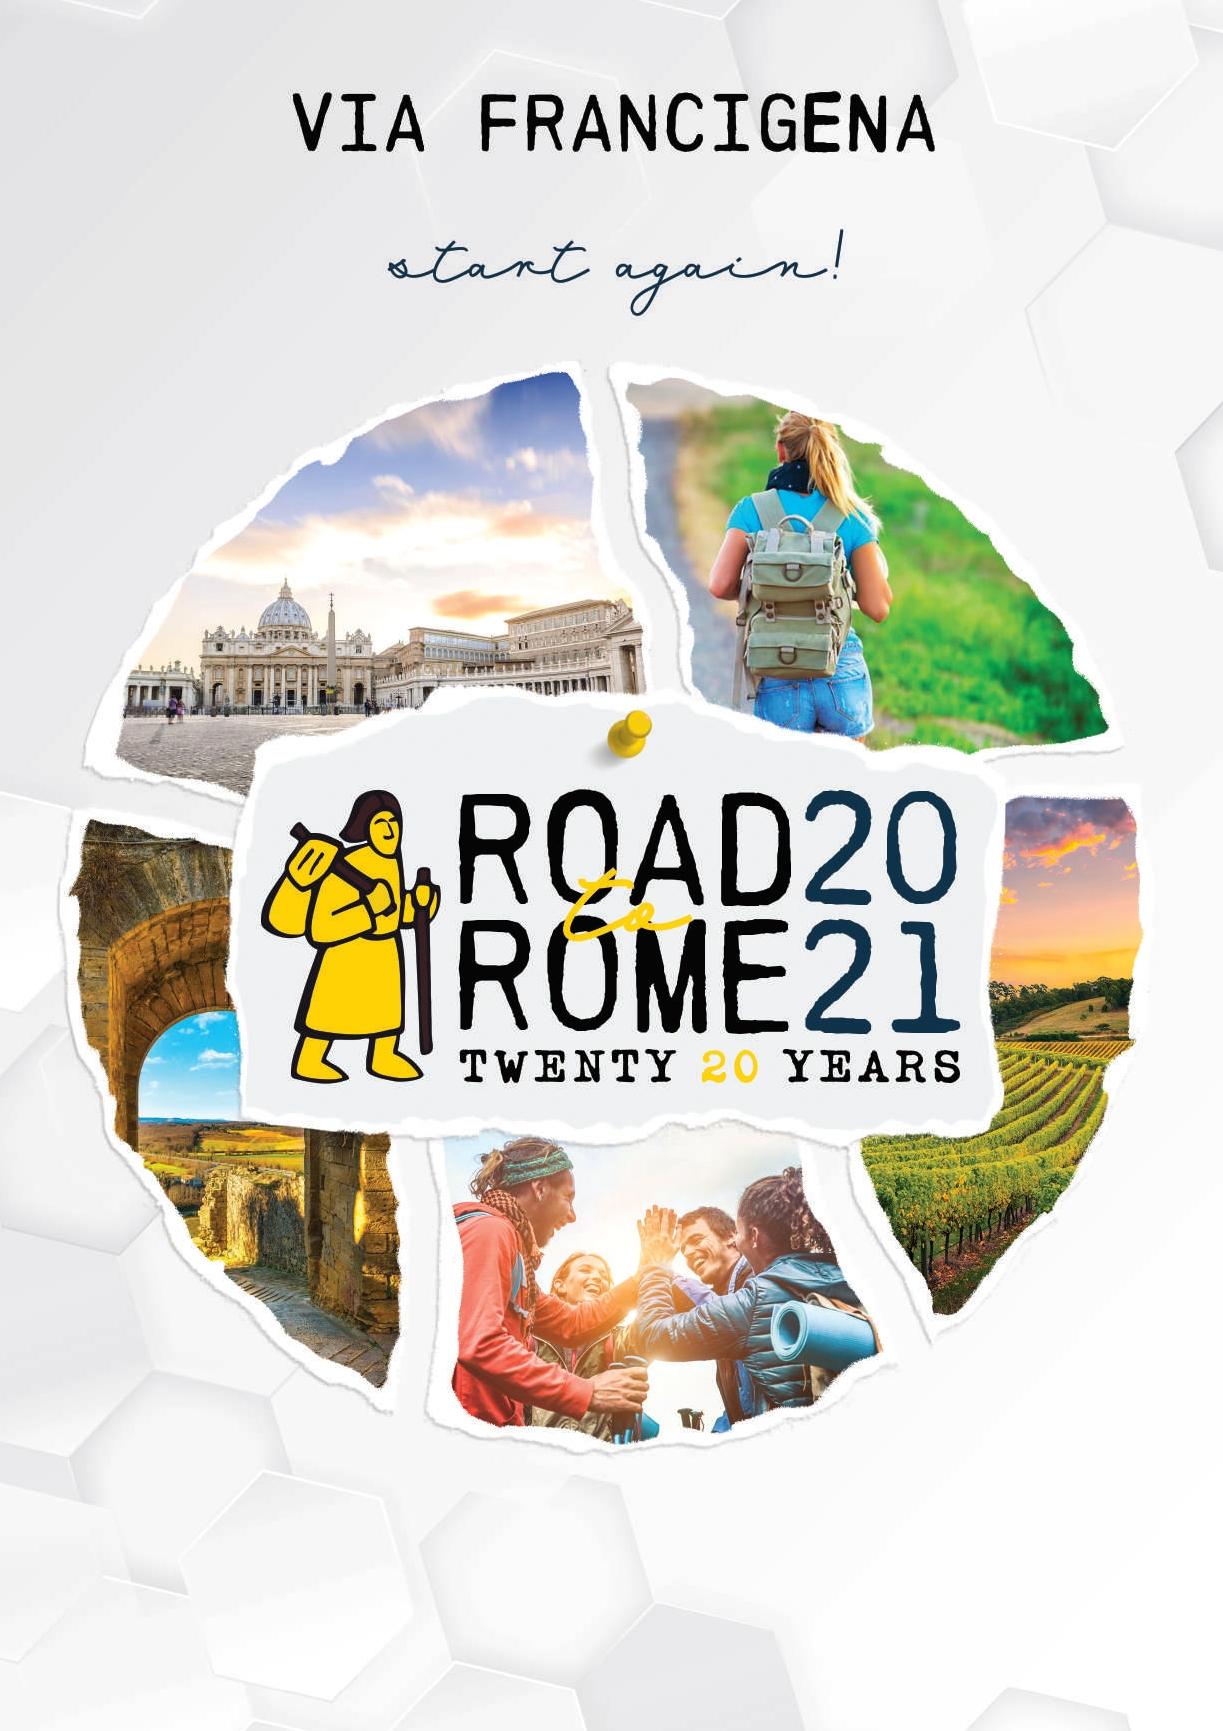 road20_to_rome21.jpg